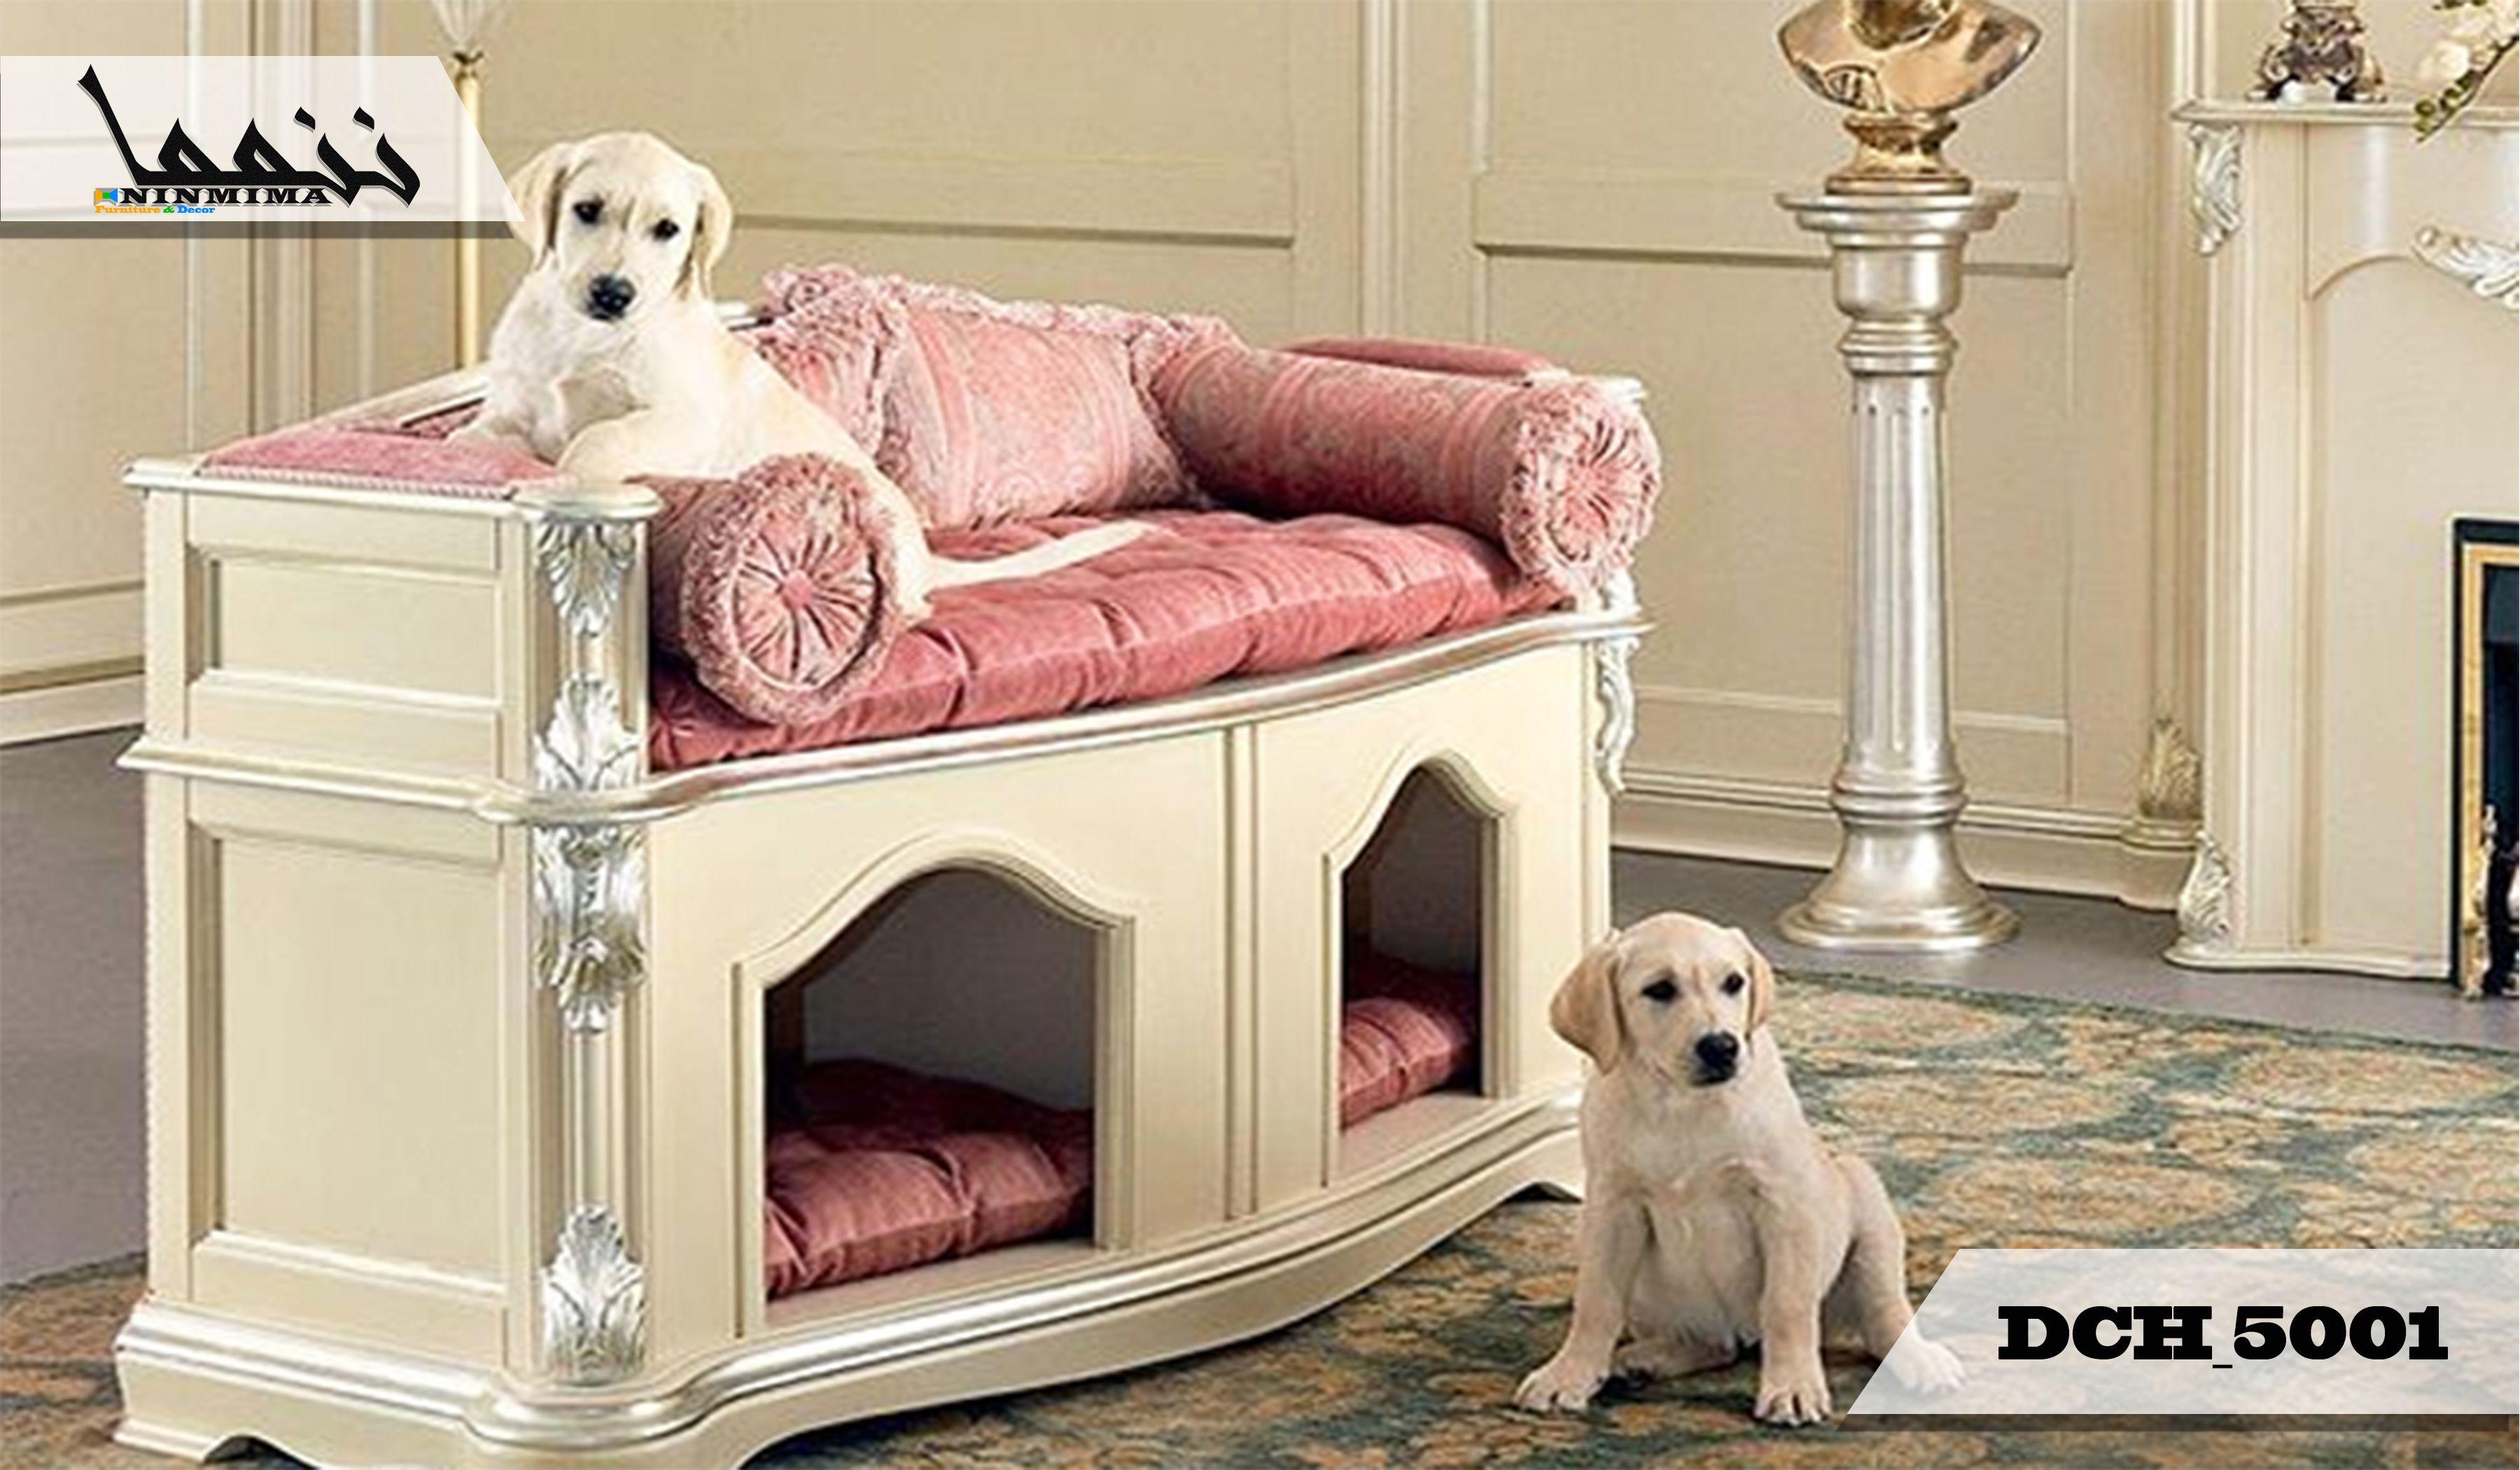 Classic Dog Cat House Dog Cat Pouf Poufs Ninmima Classic Classy Victorian Modern Karachi Khi Karac Dog Furniture Luxury Dog House Cool Dog Houses